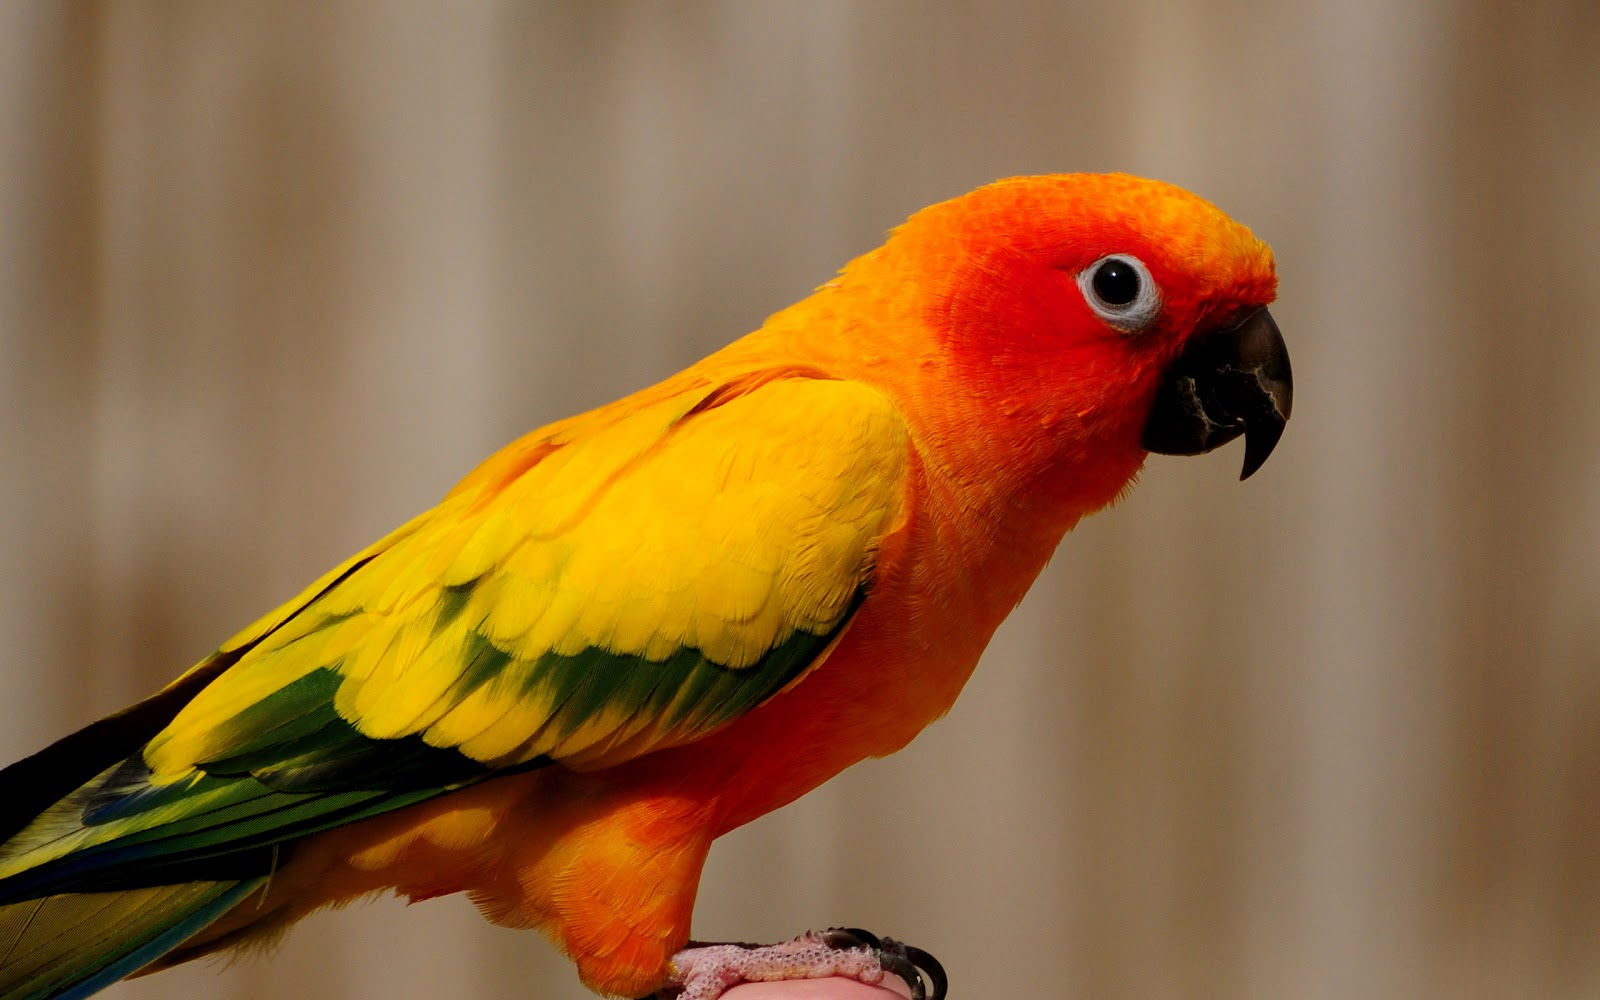 Cute Penguin Mac Wallpaper Picture Orange Yellow Parrot